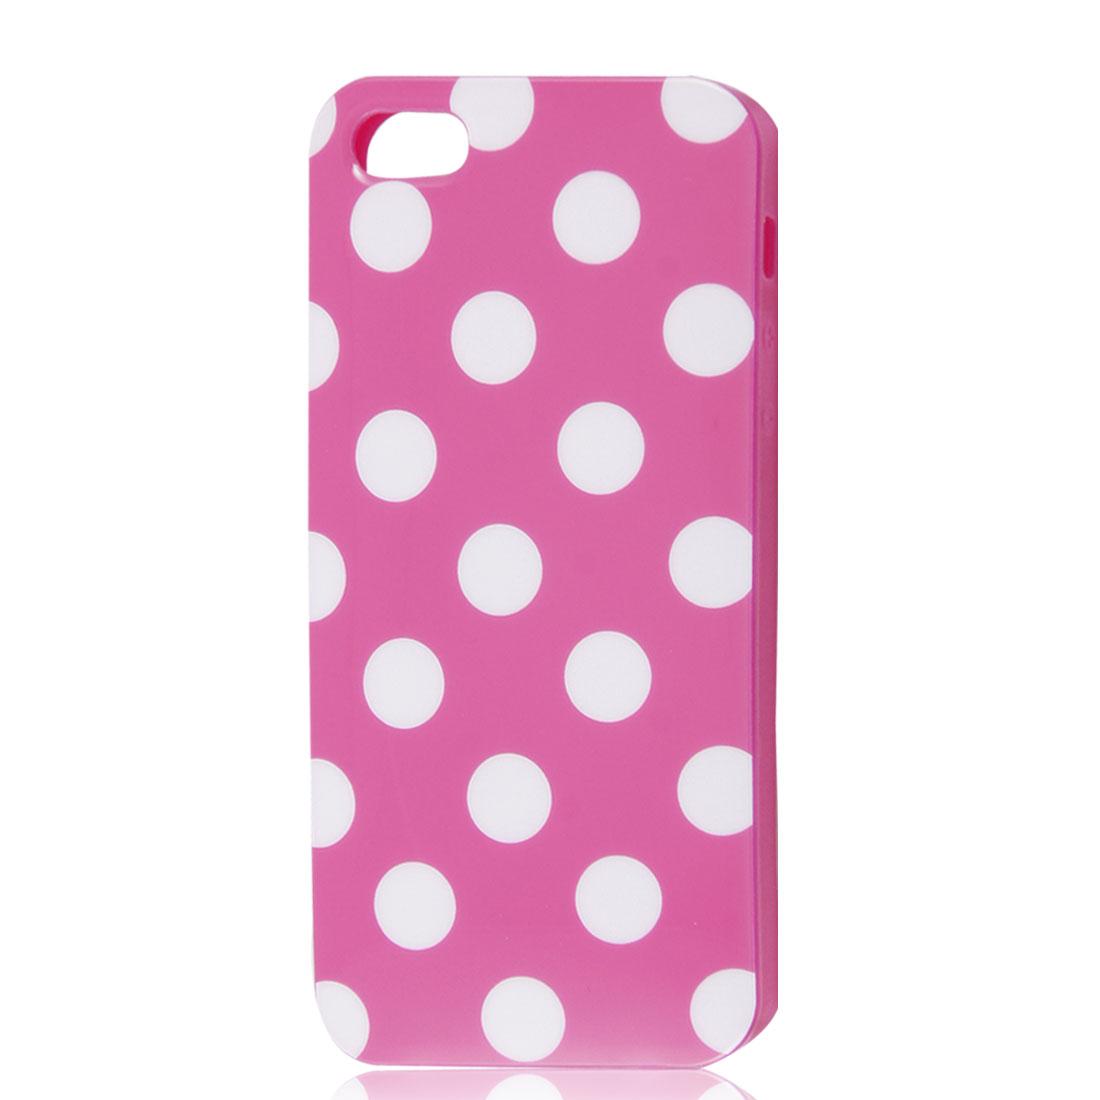 White Polka Dots Fuchsia Soft Plastic Case Cover for Apple iPhone 5 5G